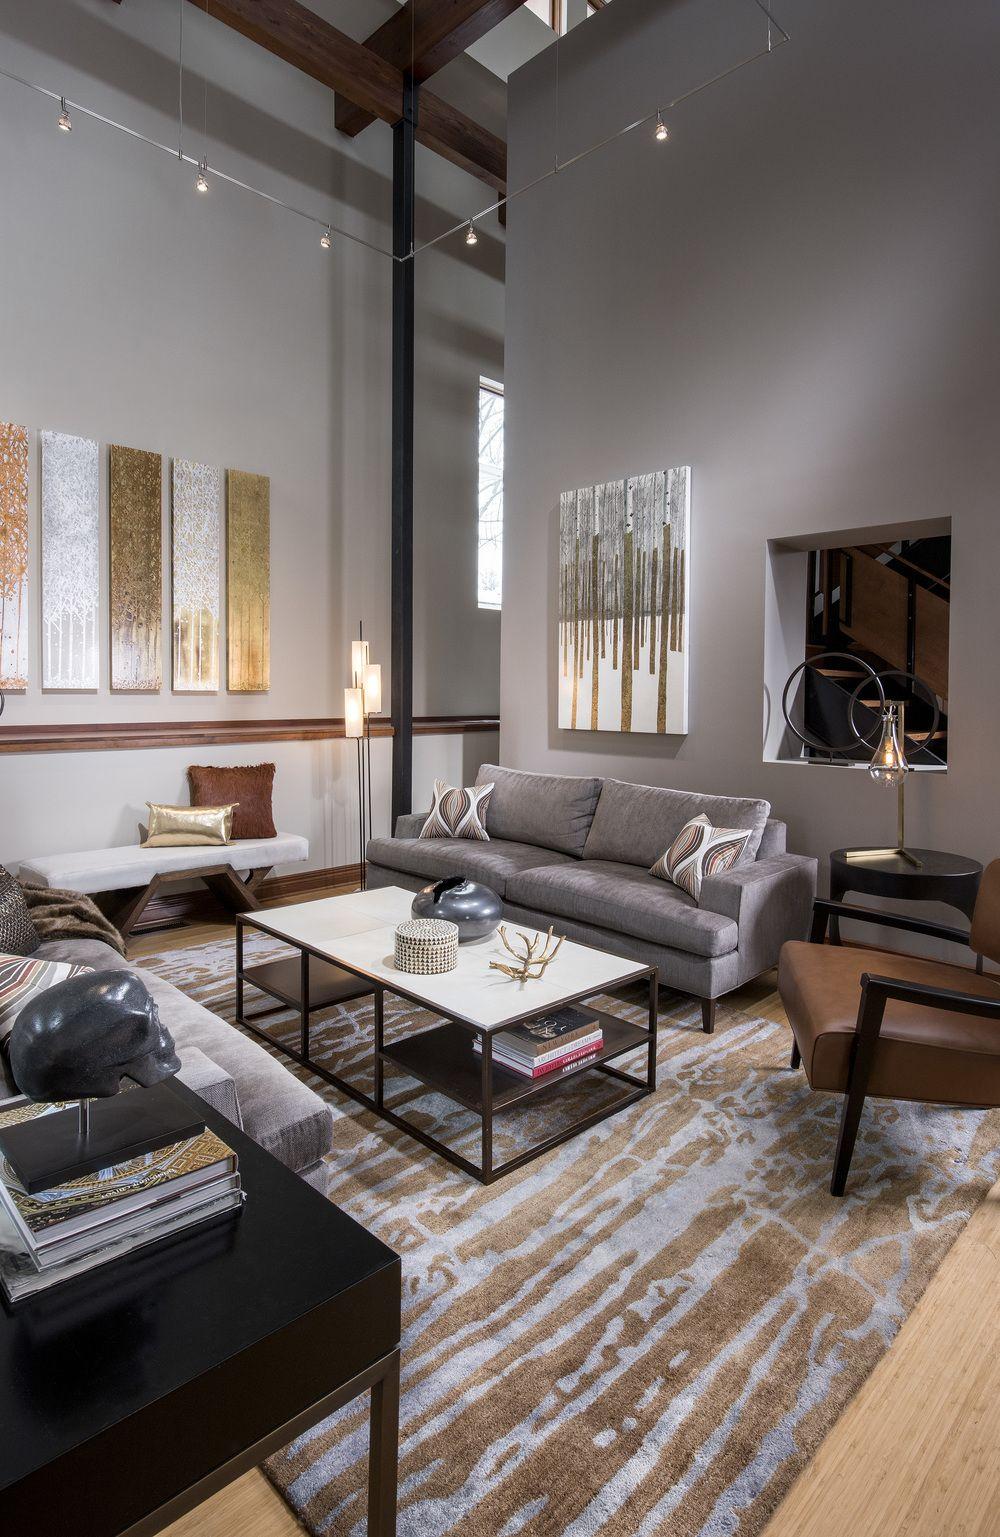 Design Masculine Living Room modern organic earthy bachelor pad donna mondi interior design masculine livingroom